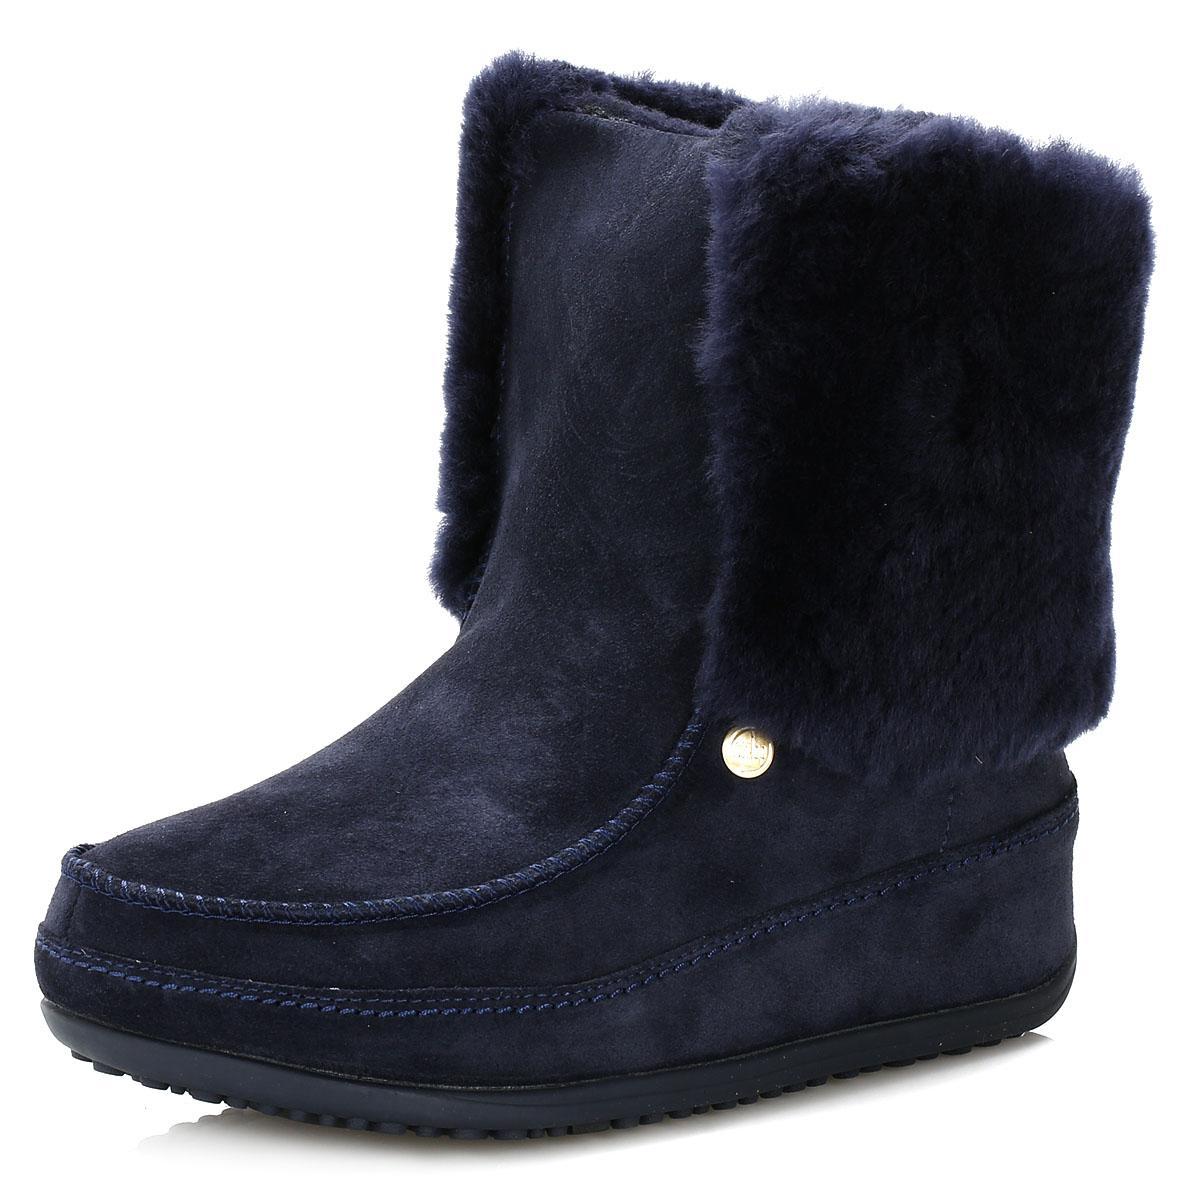 587dbcf07292c5 Lyst - Fitflop Womens Supernavy Supercuff Mukluk Boots in Blue